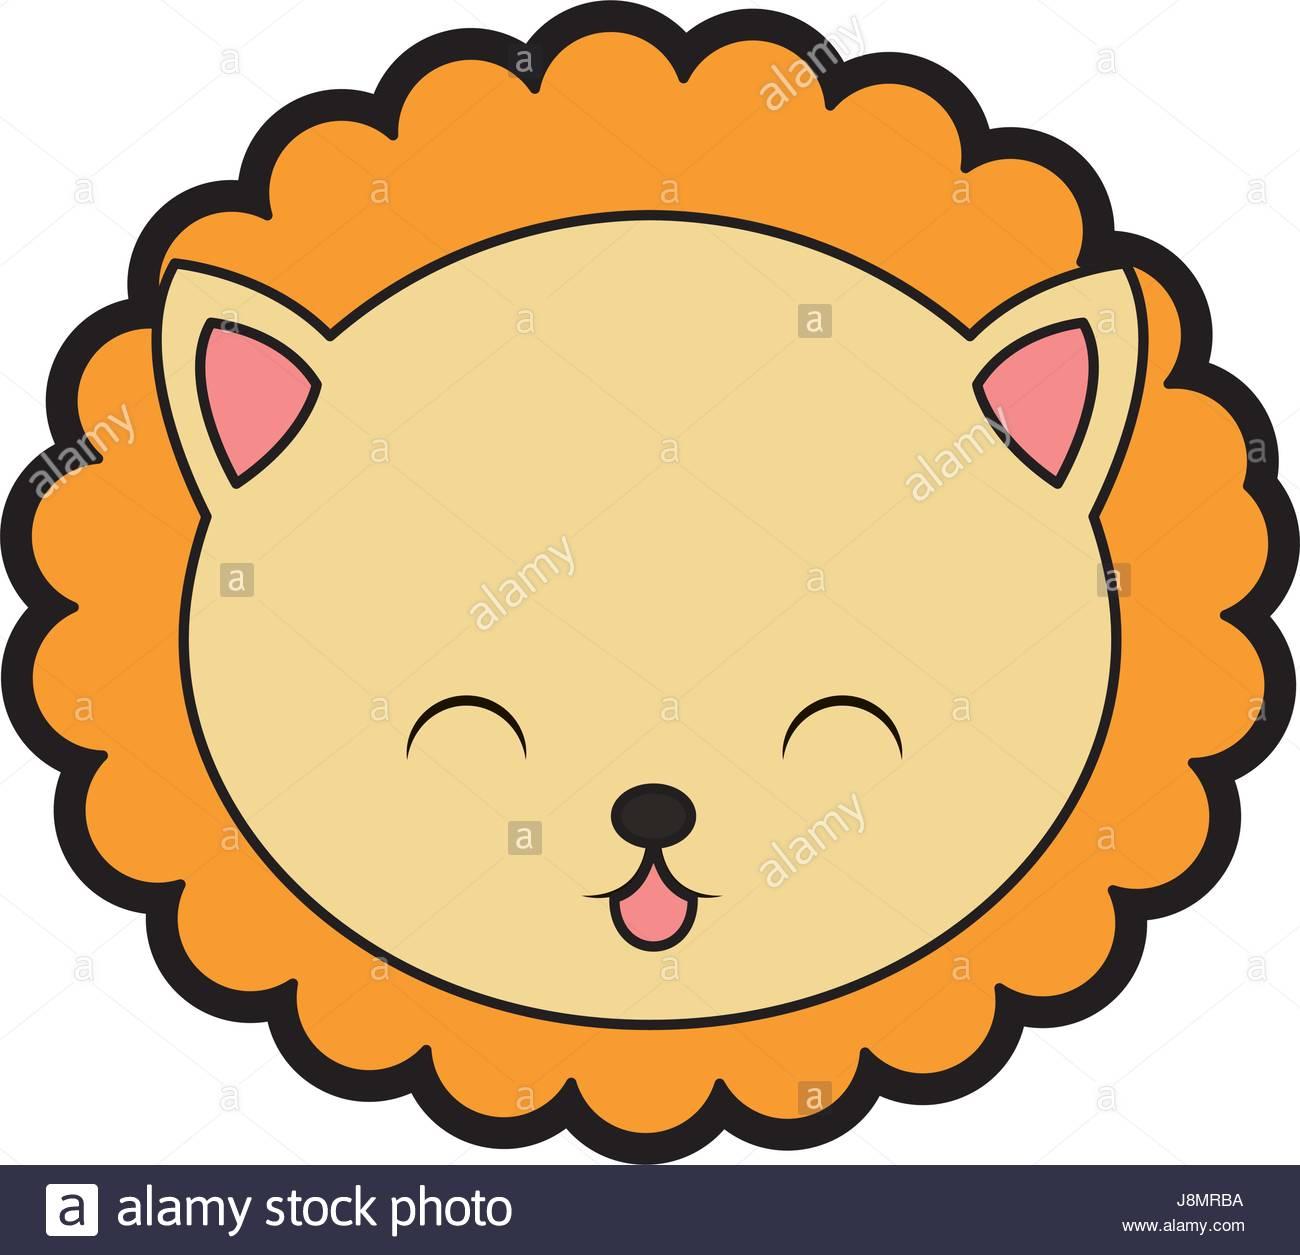 1300x1255 cute lion face cartoon Stock Vector Art amp Illustration, Vector